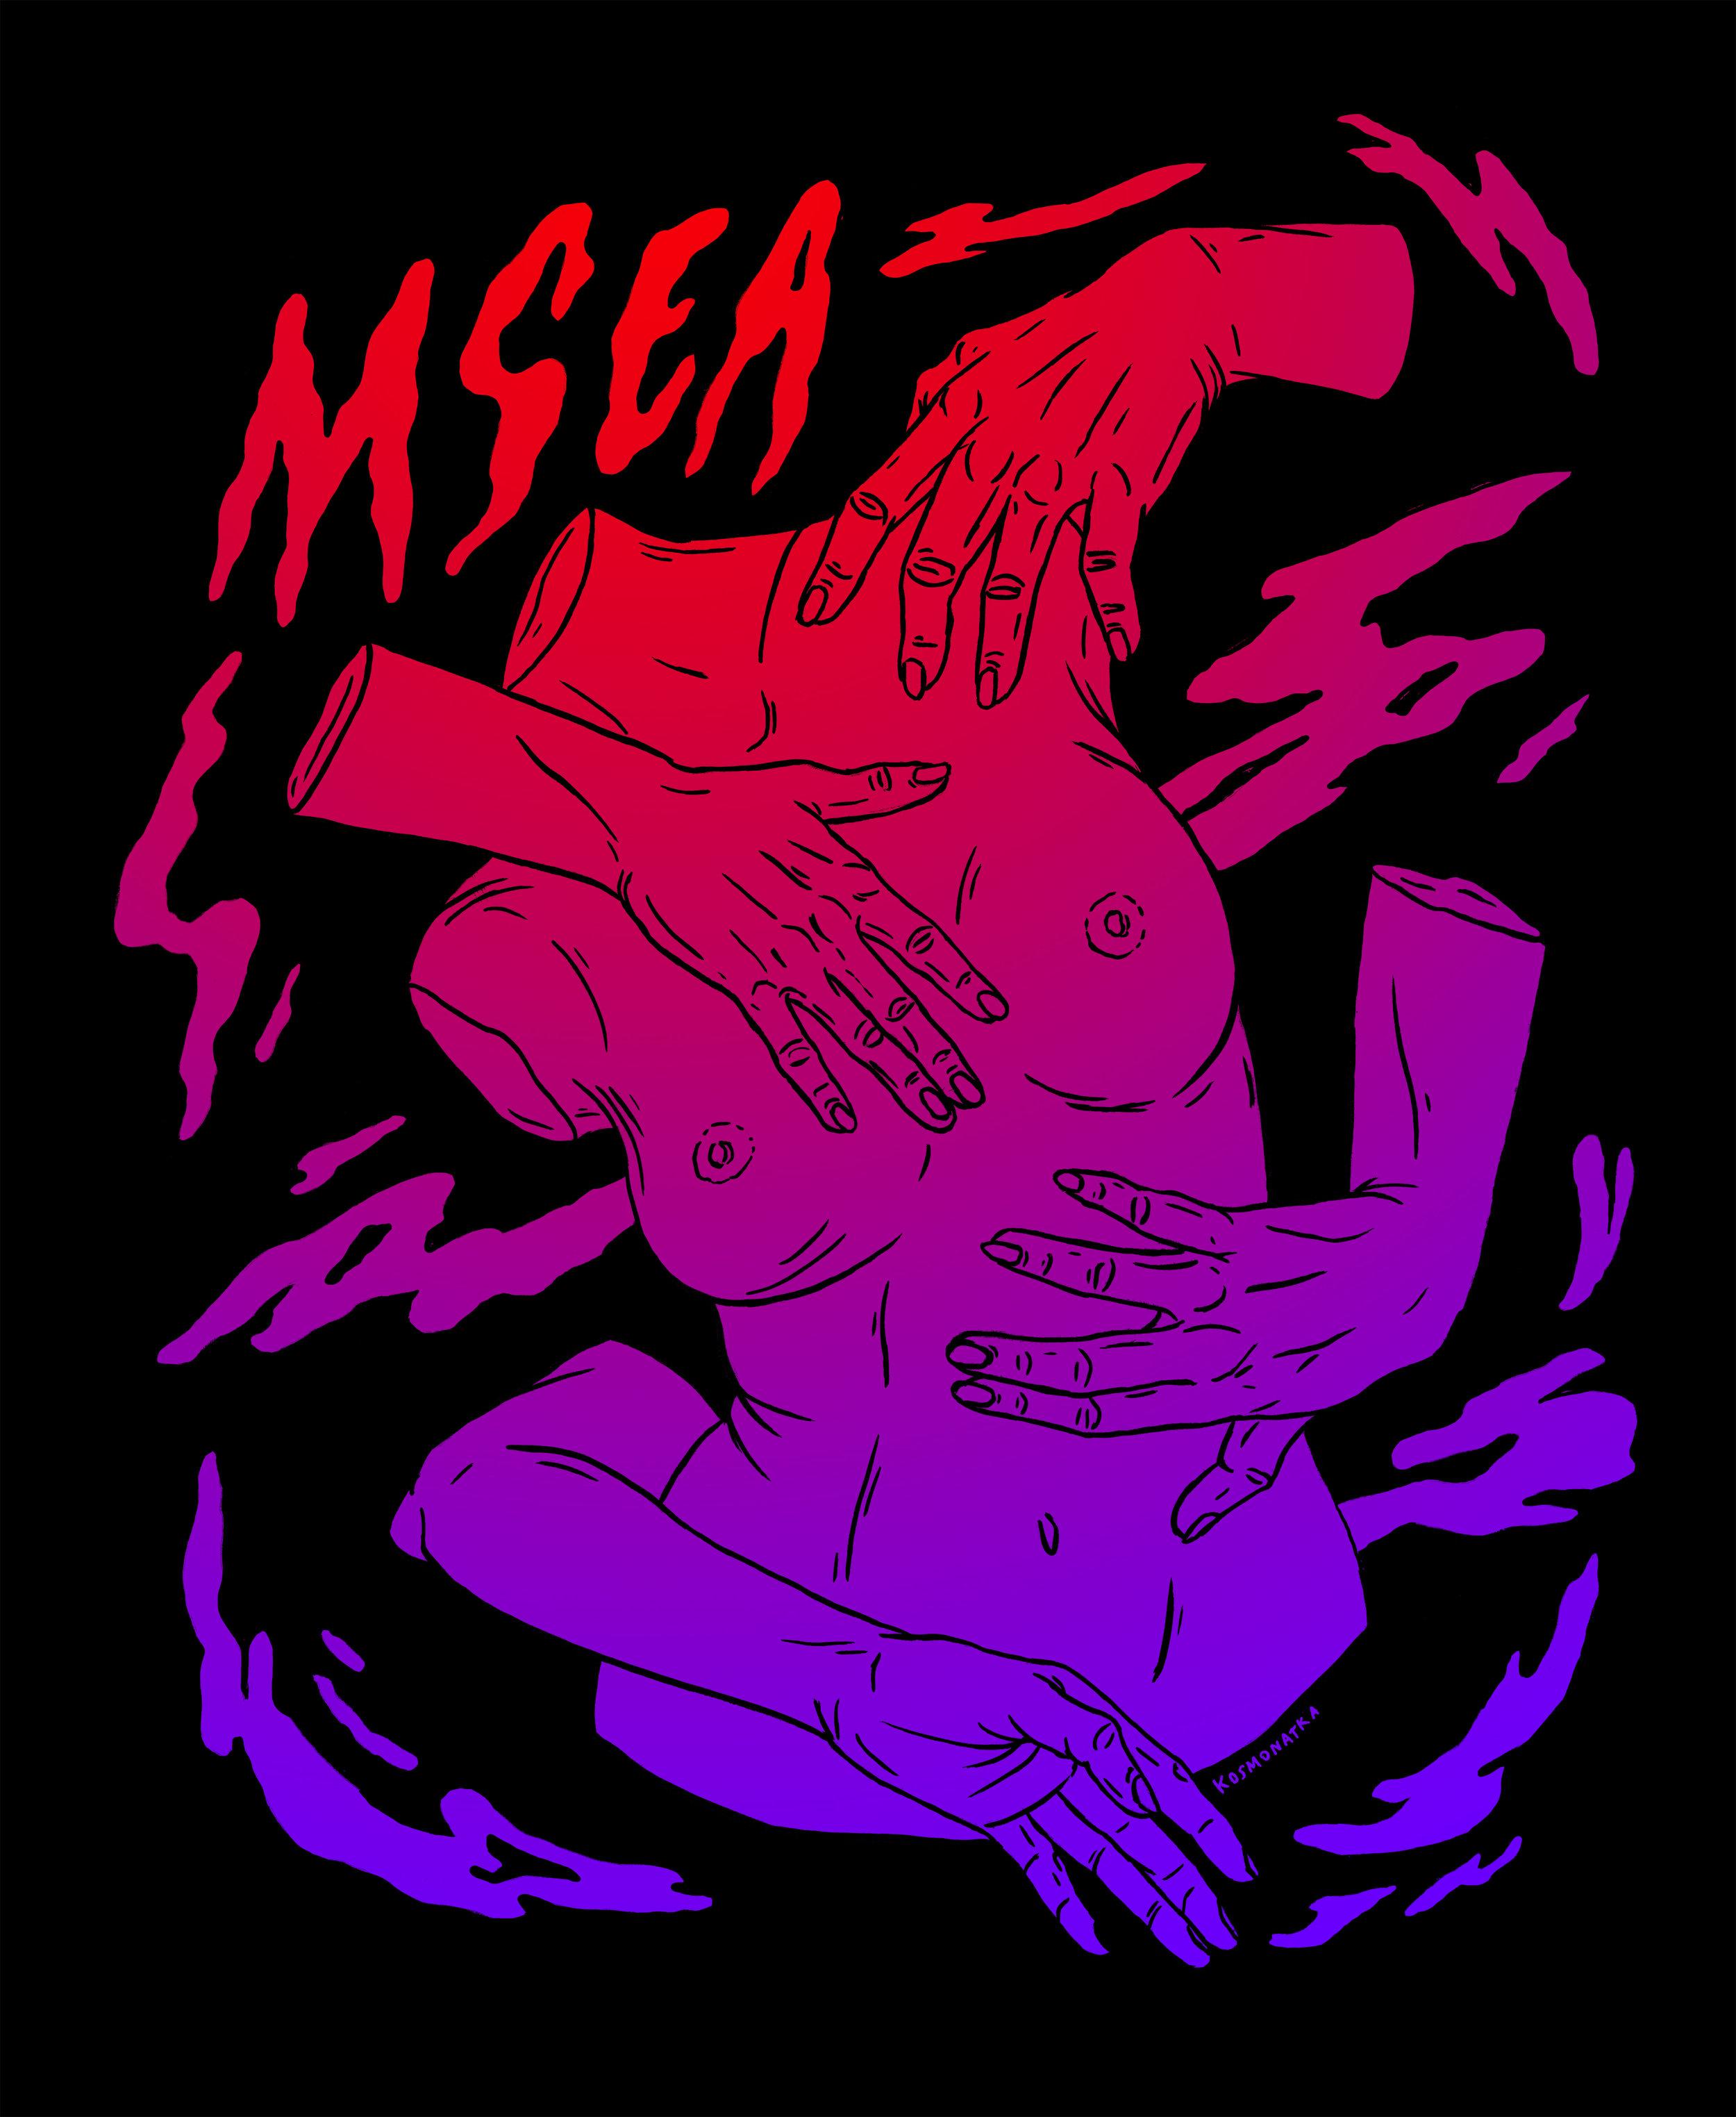 MSEA, 2019